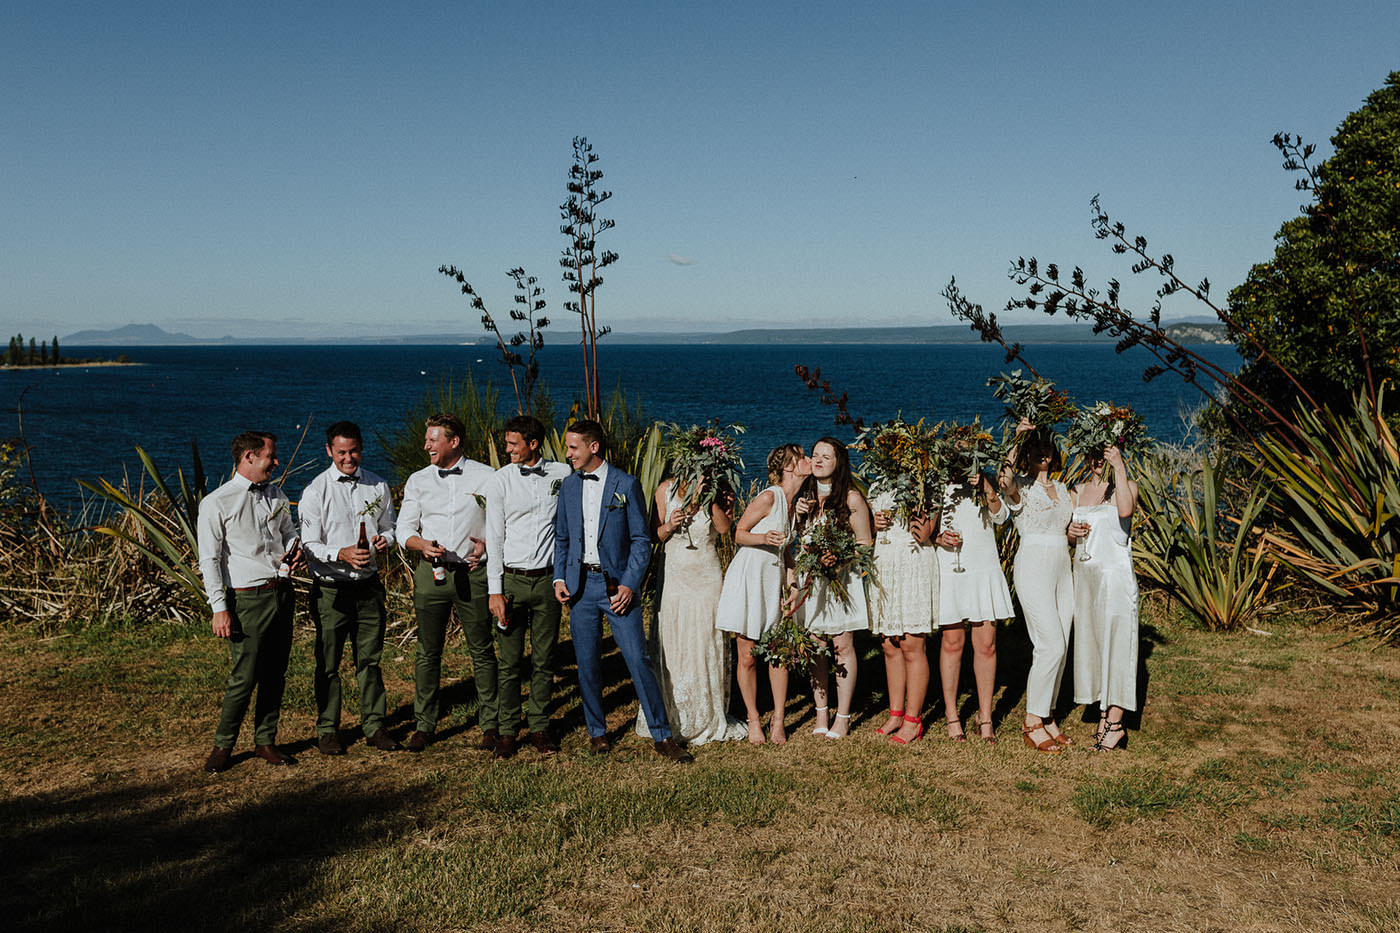 wedding_photographer_nz-00099.jpg